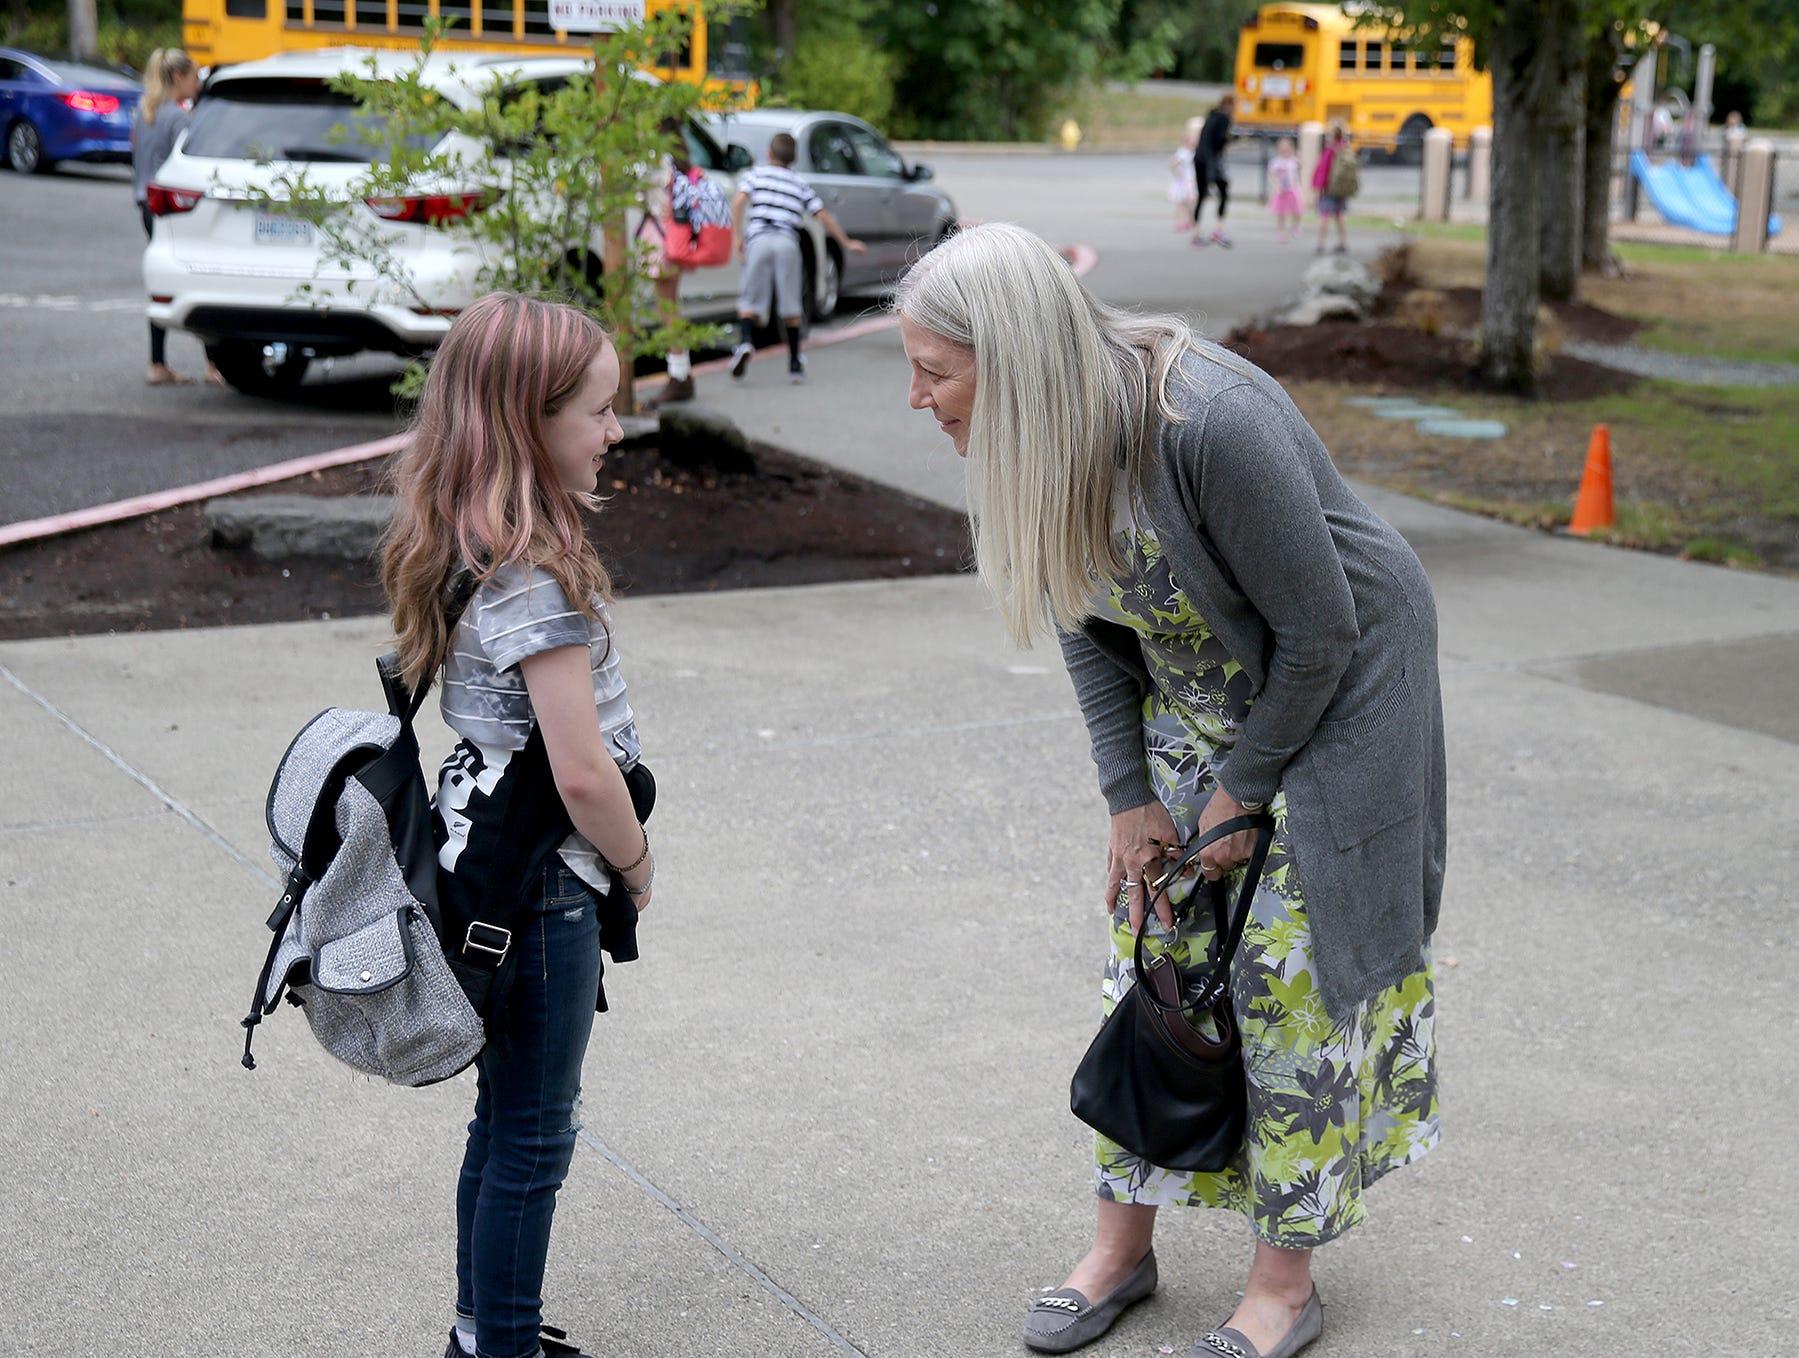 Kitsap Lake Elementary School principal Karen Rommen welcomes fourth-grader Kylee Starn on the first day of school on Wednesday.